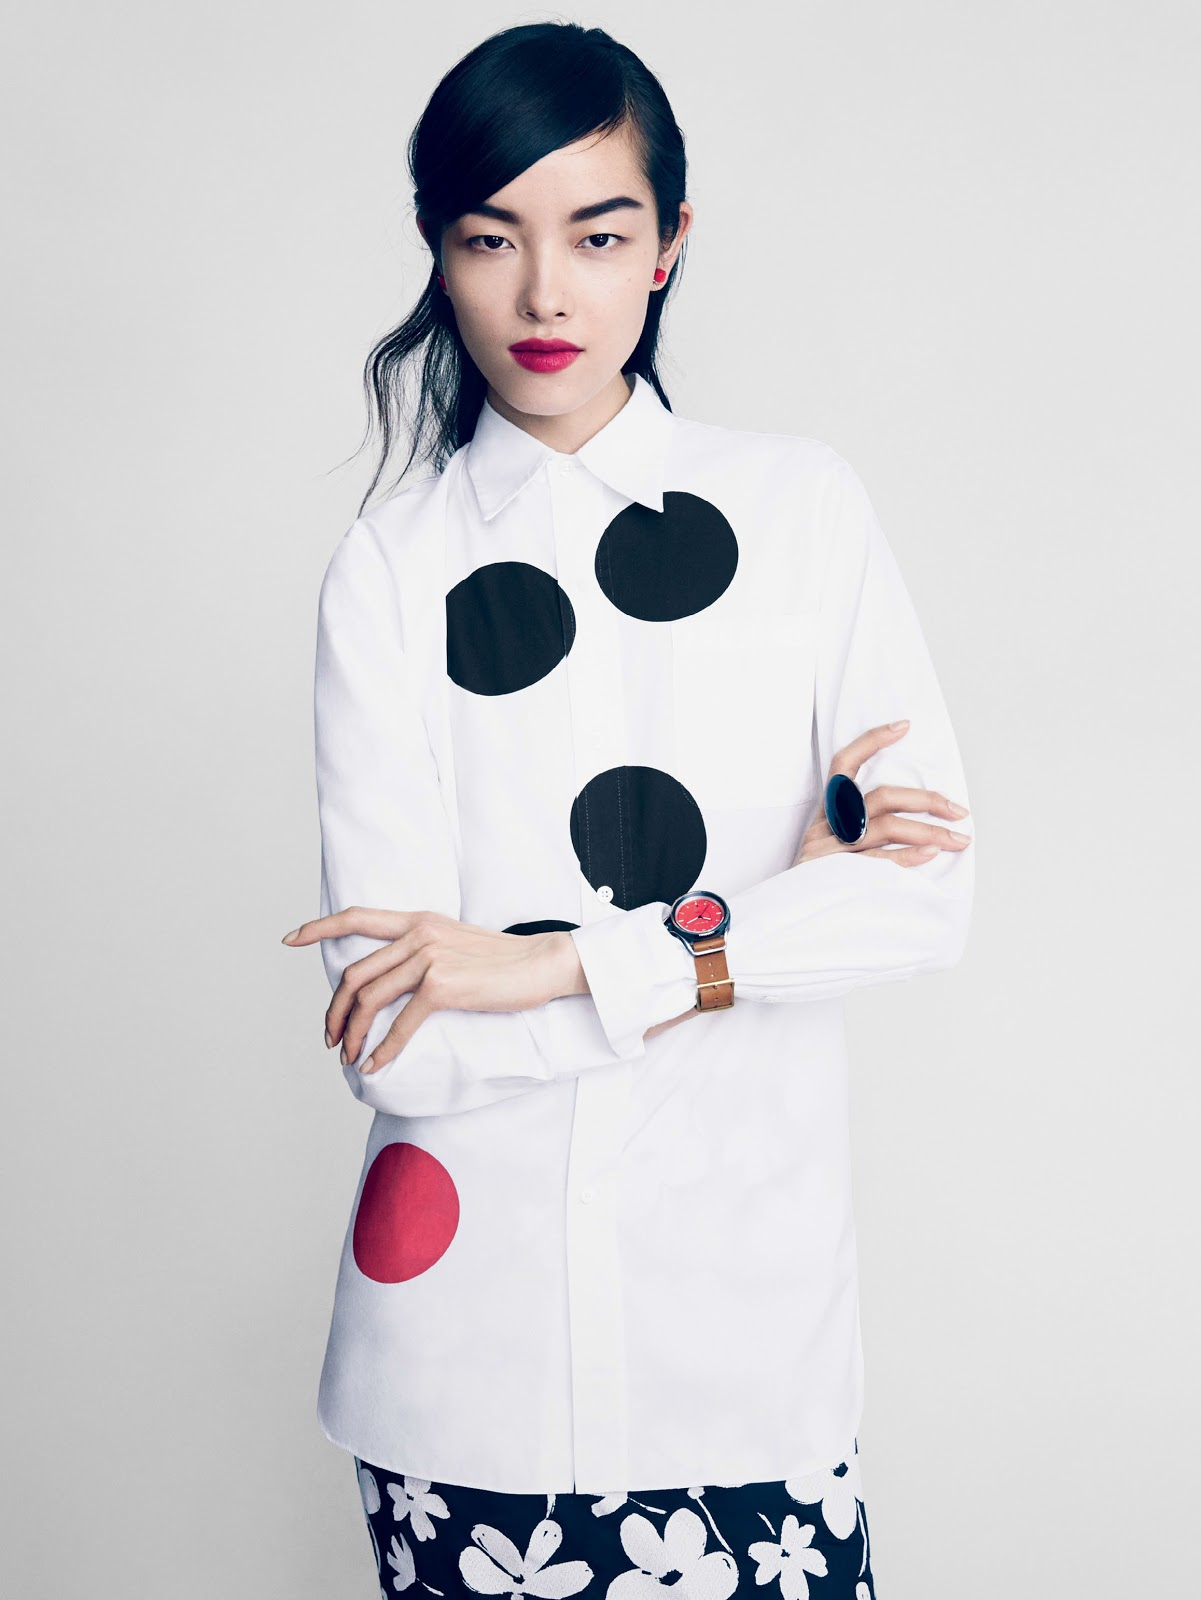 2019 year style- Sasha Pivovarova, Fei Fei Sun Anais Mali by Patrick Demarchelier for Vogue February 2014